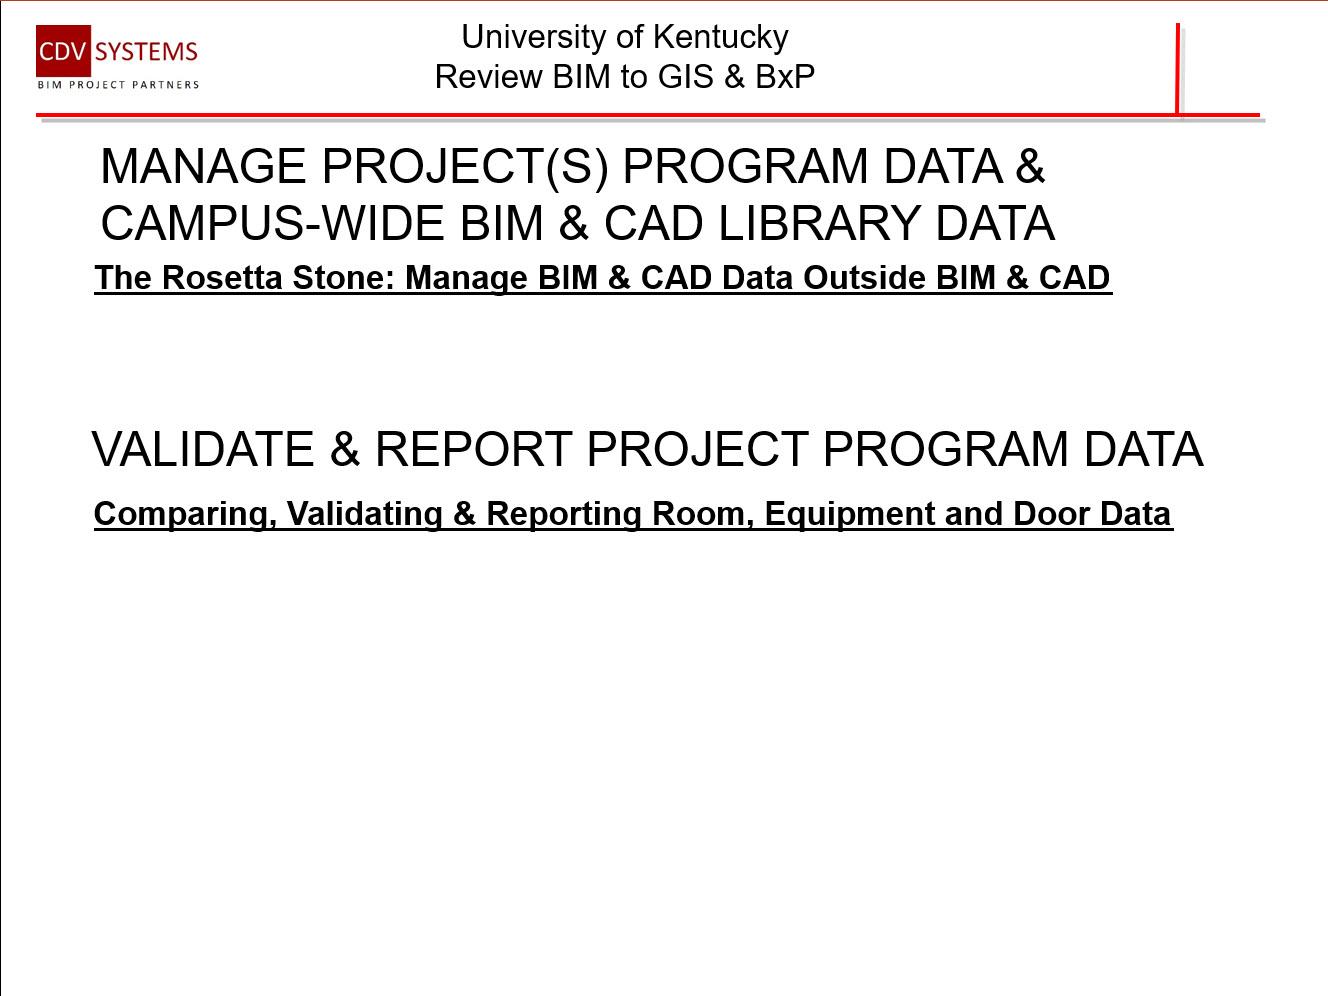 University of Kentucky_001y.jpg